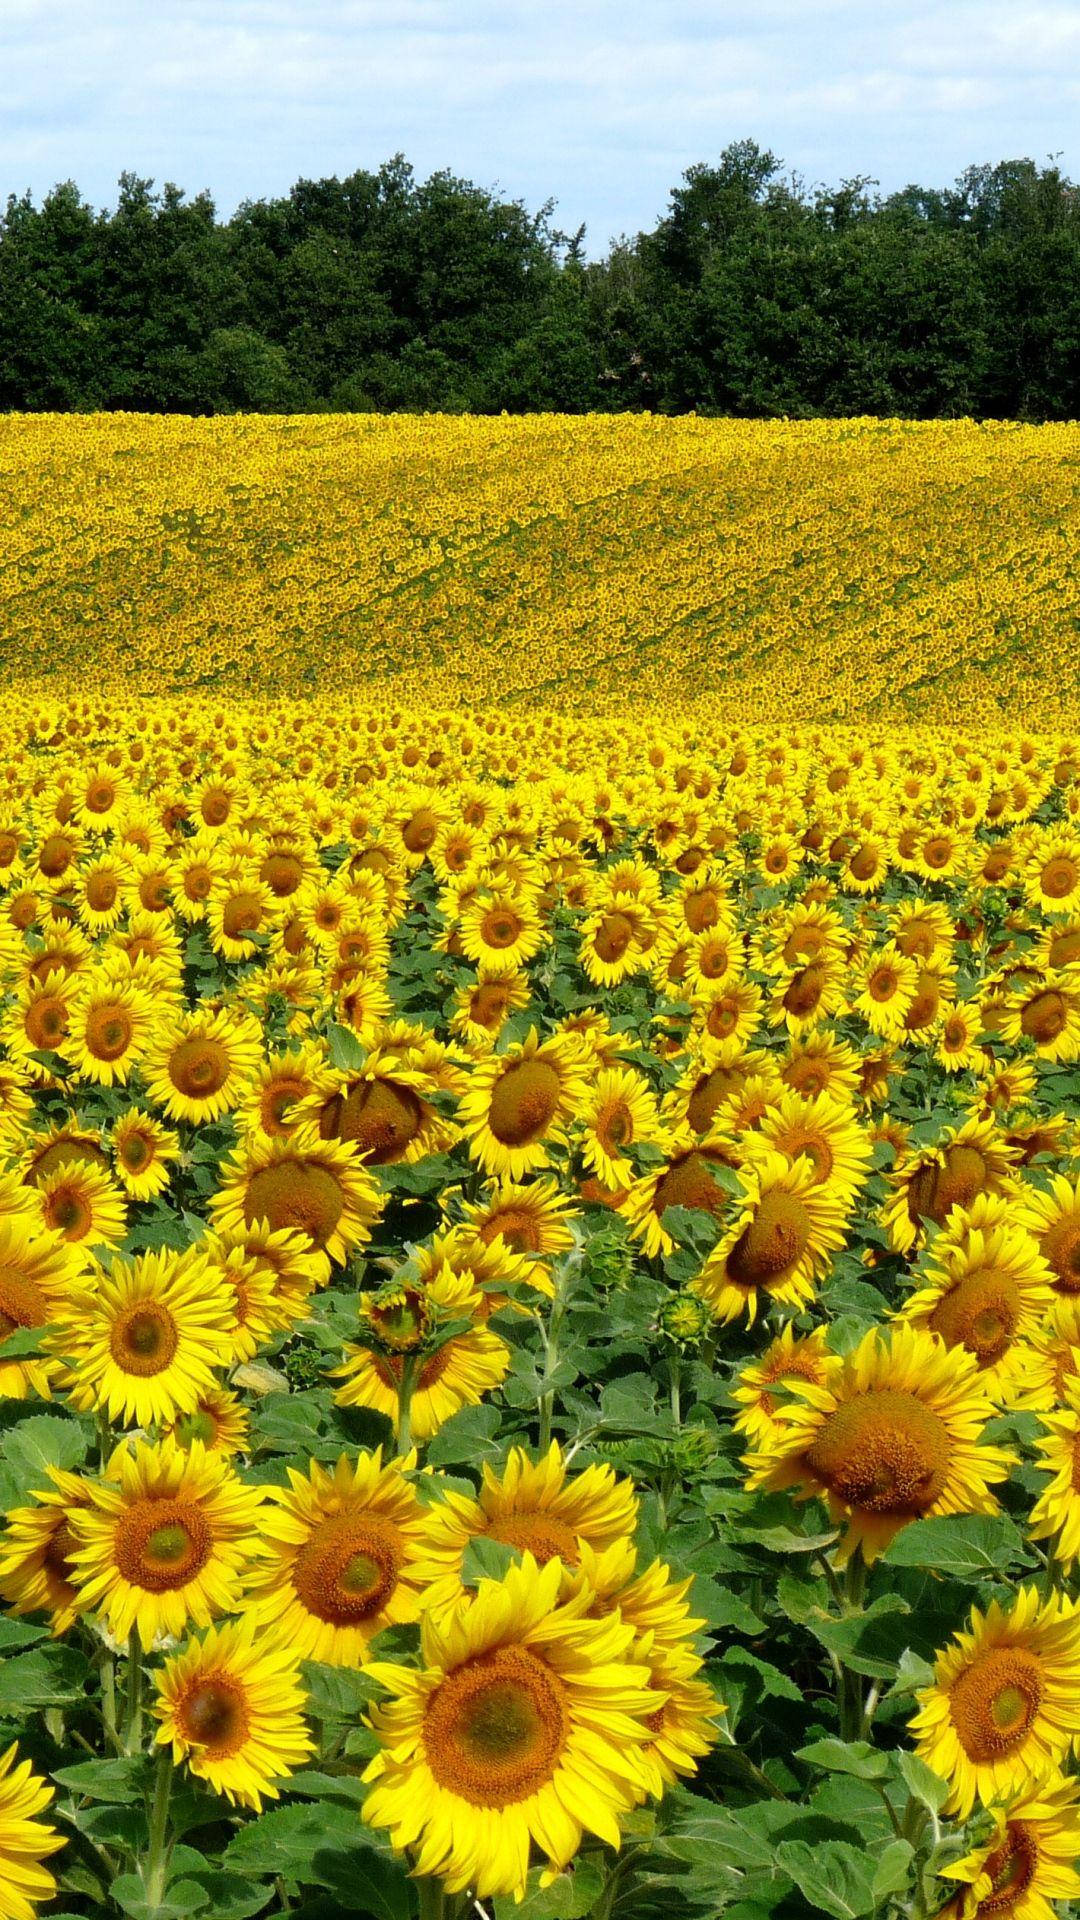 Download Wallpaper 1080x1920 Field, Sunflowers, Landscape, Summer Sony Xperia Z1, ZL, Z, Samsung Galaxy S4, HTC One HD Background